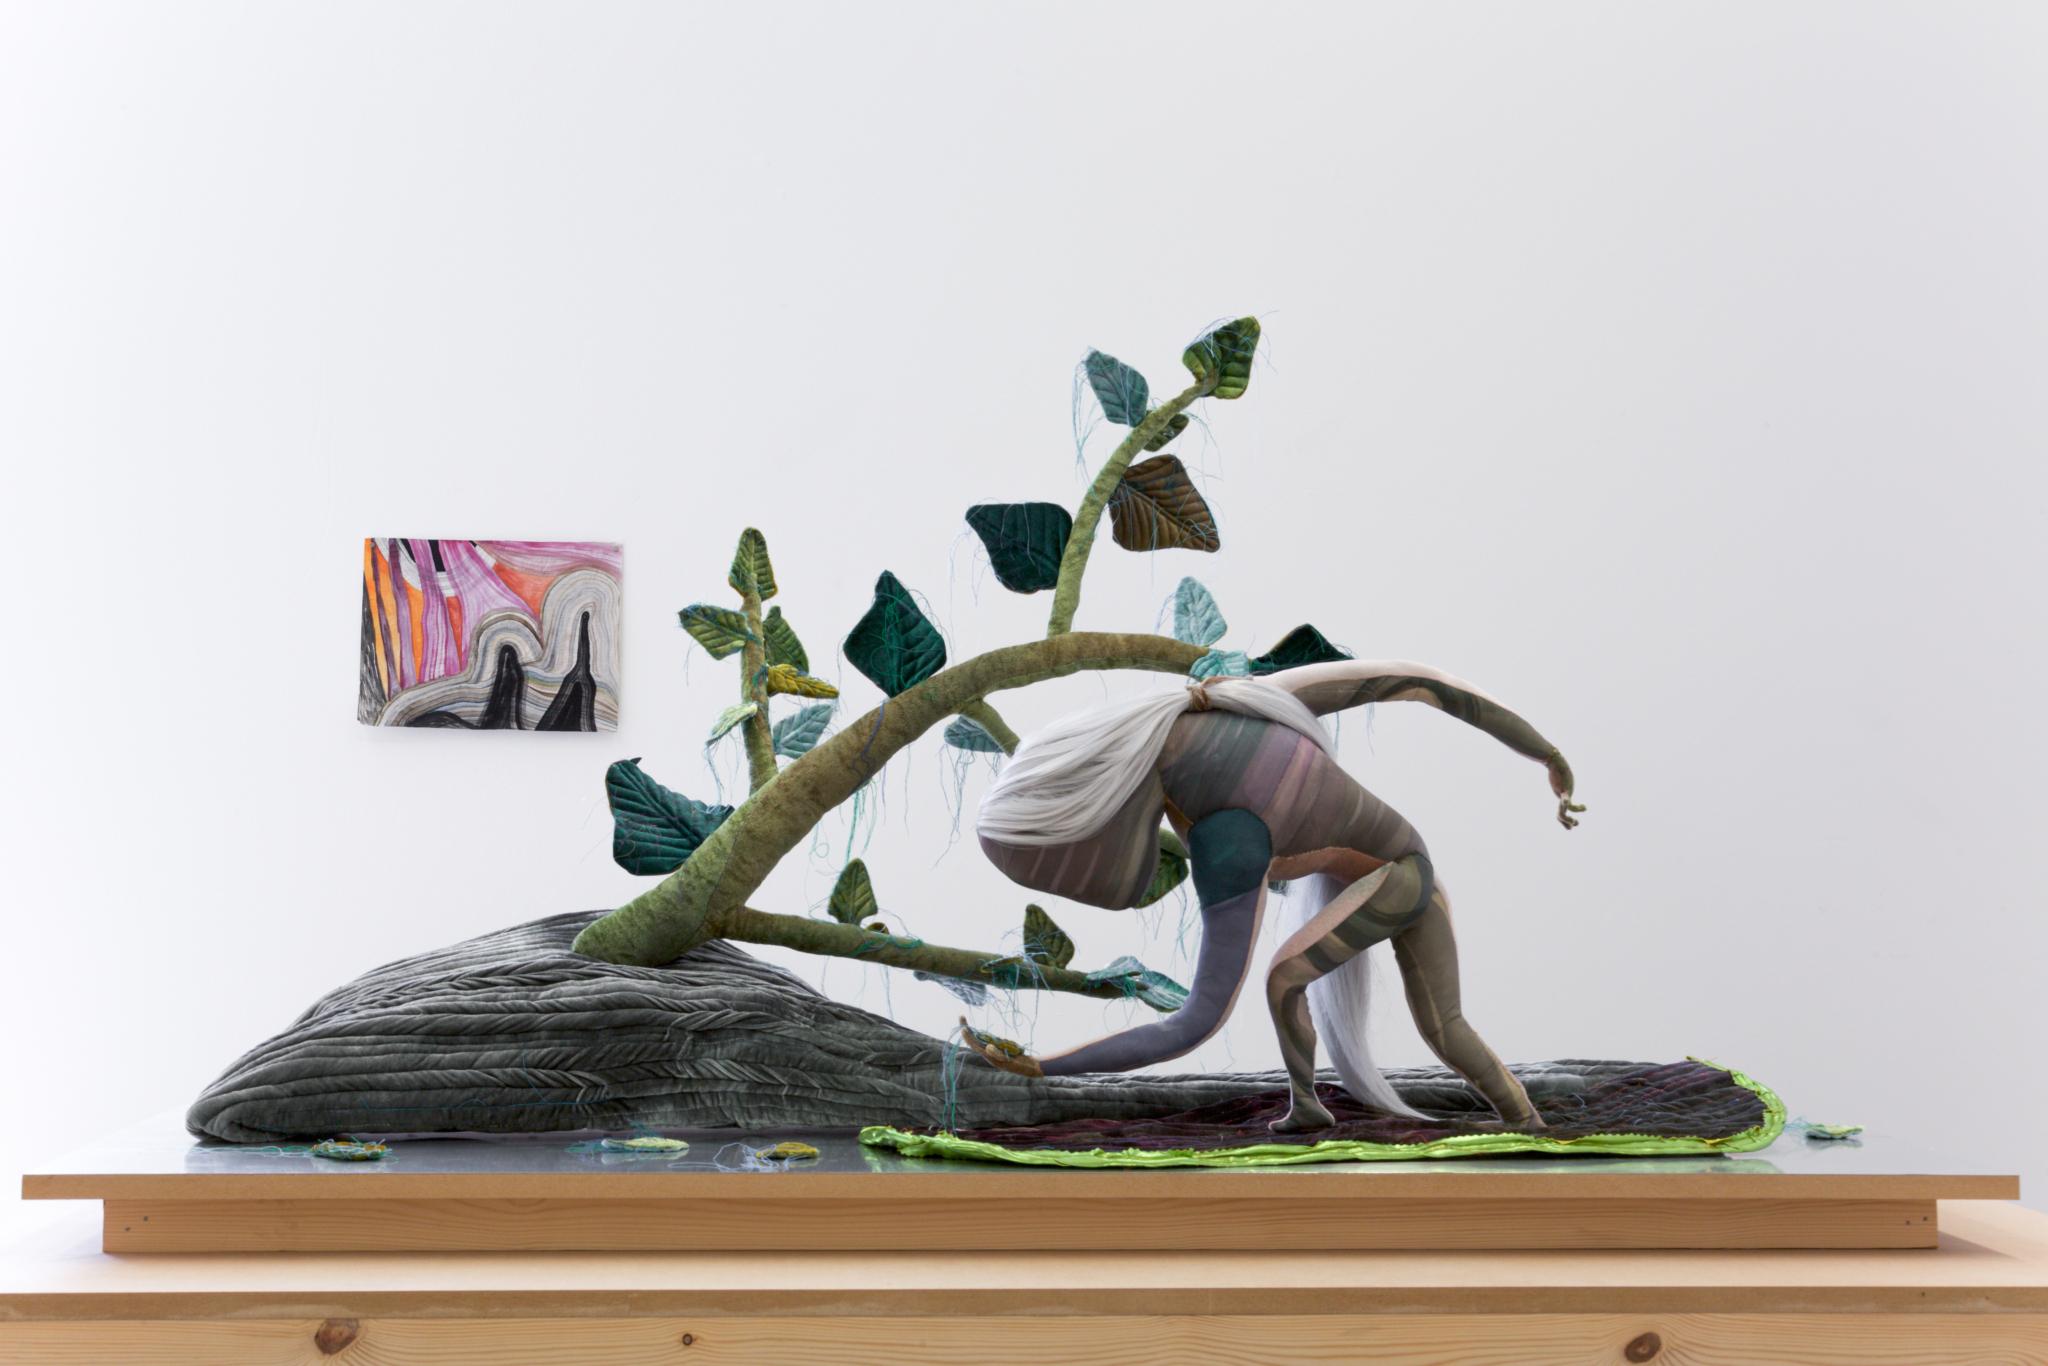 Emma Talbot Ghost Calls And Meditations Kunsthaus Centredart Pasquart2021 Galeries2 2 photo Lia Wagner jpg